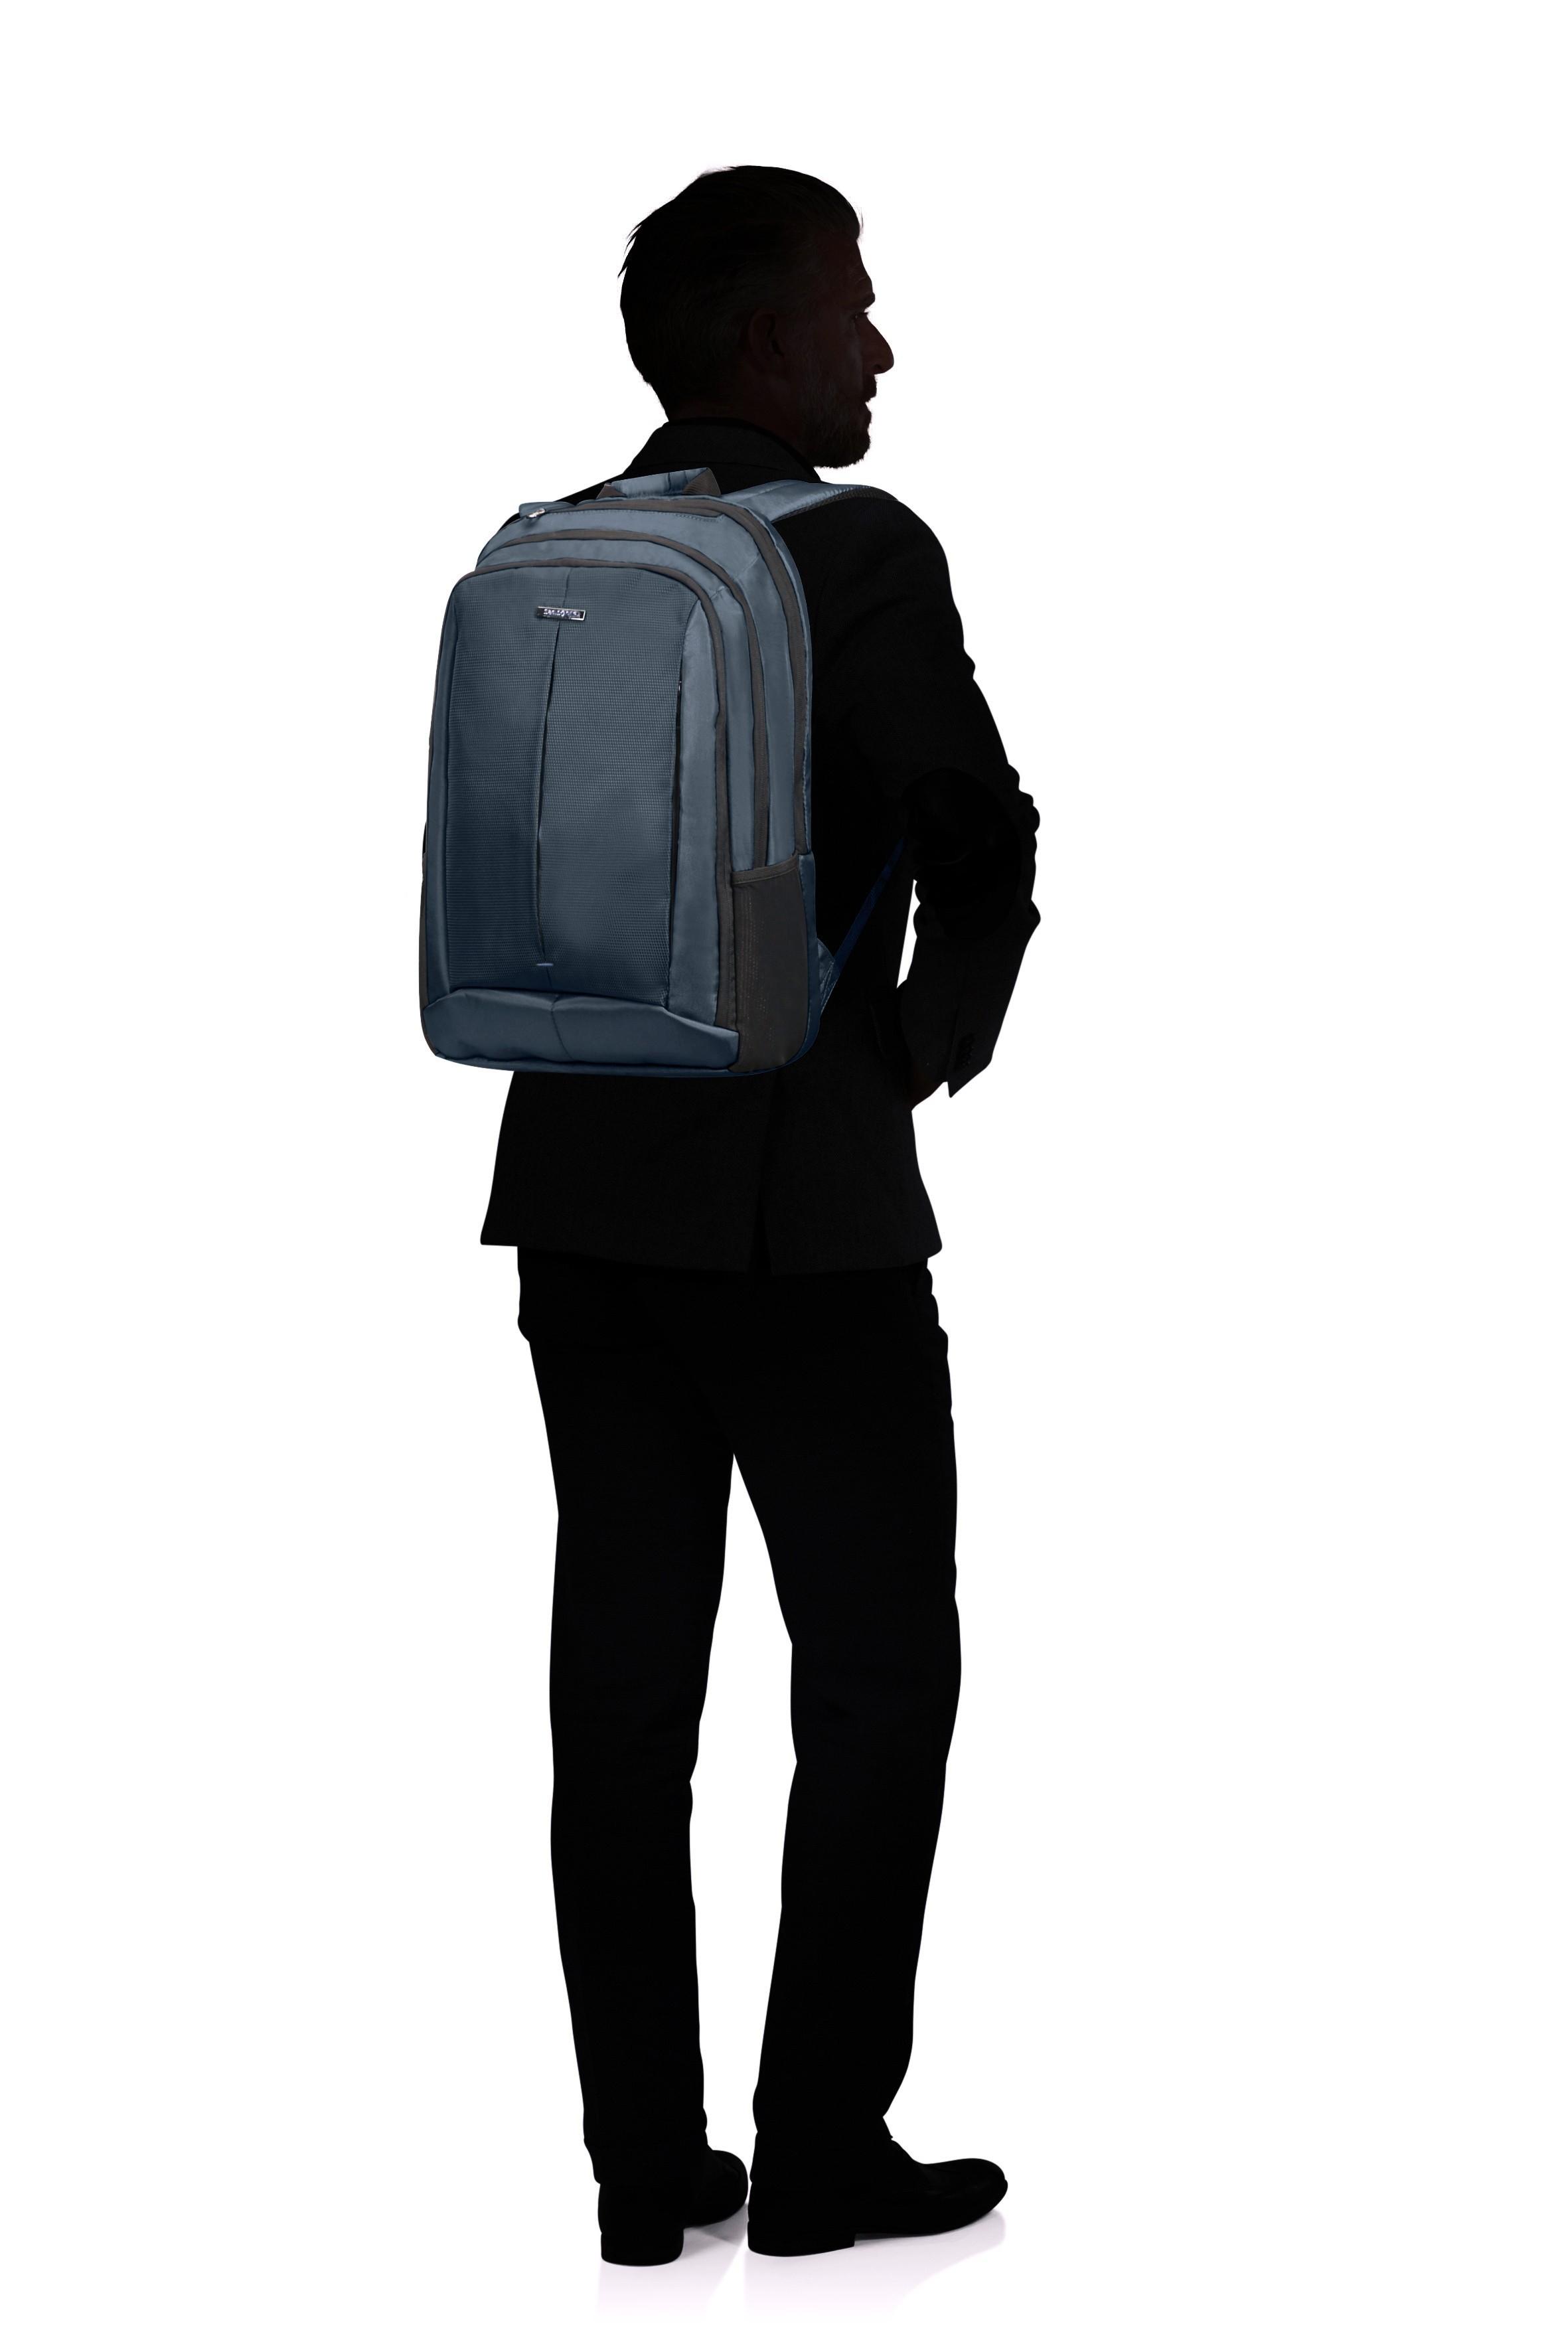 9460e4fa817 Samsonite GuardIT 2.0 Laptop Backpack L 17.3'' blue - Taska lederwaren